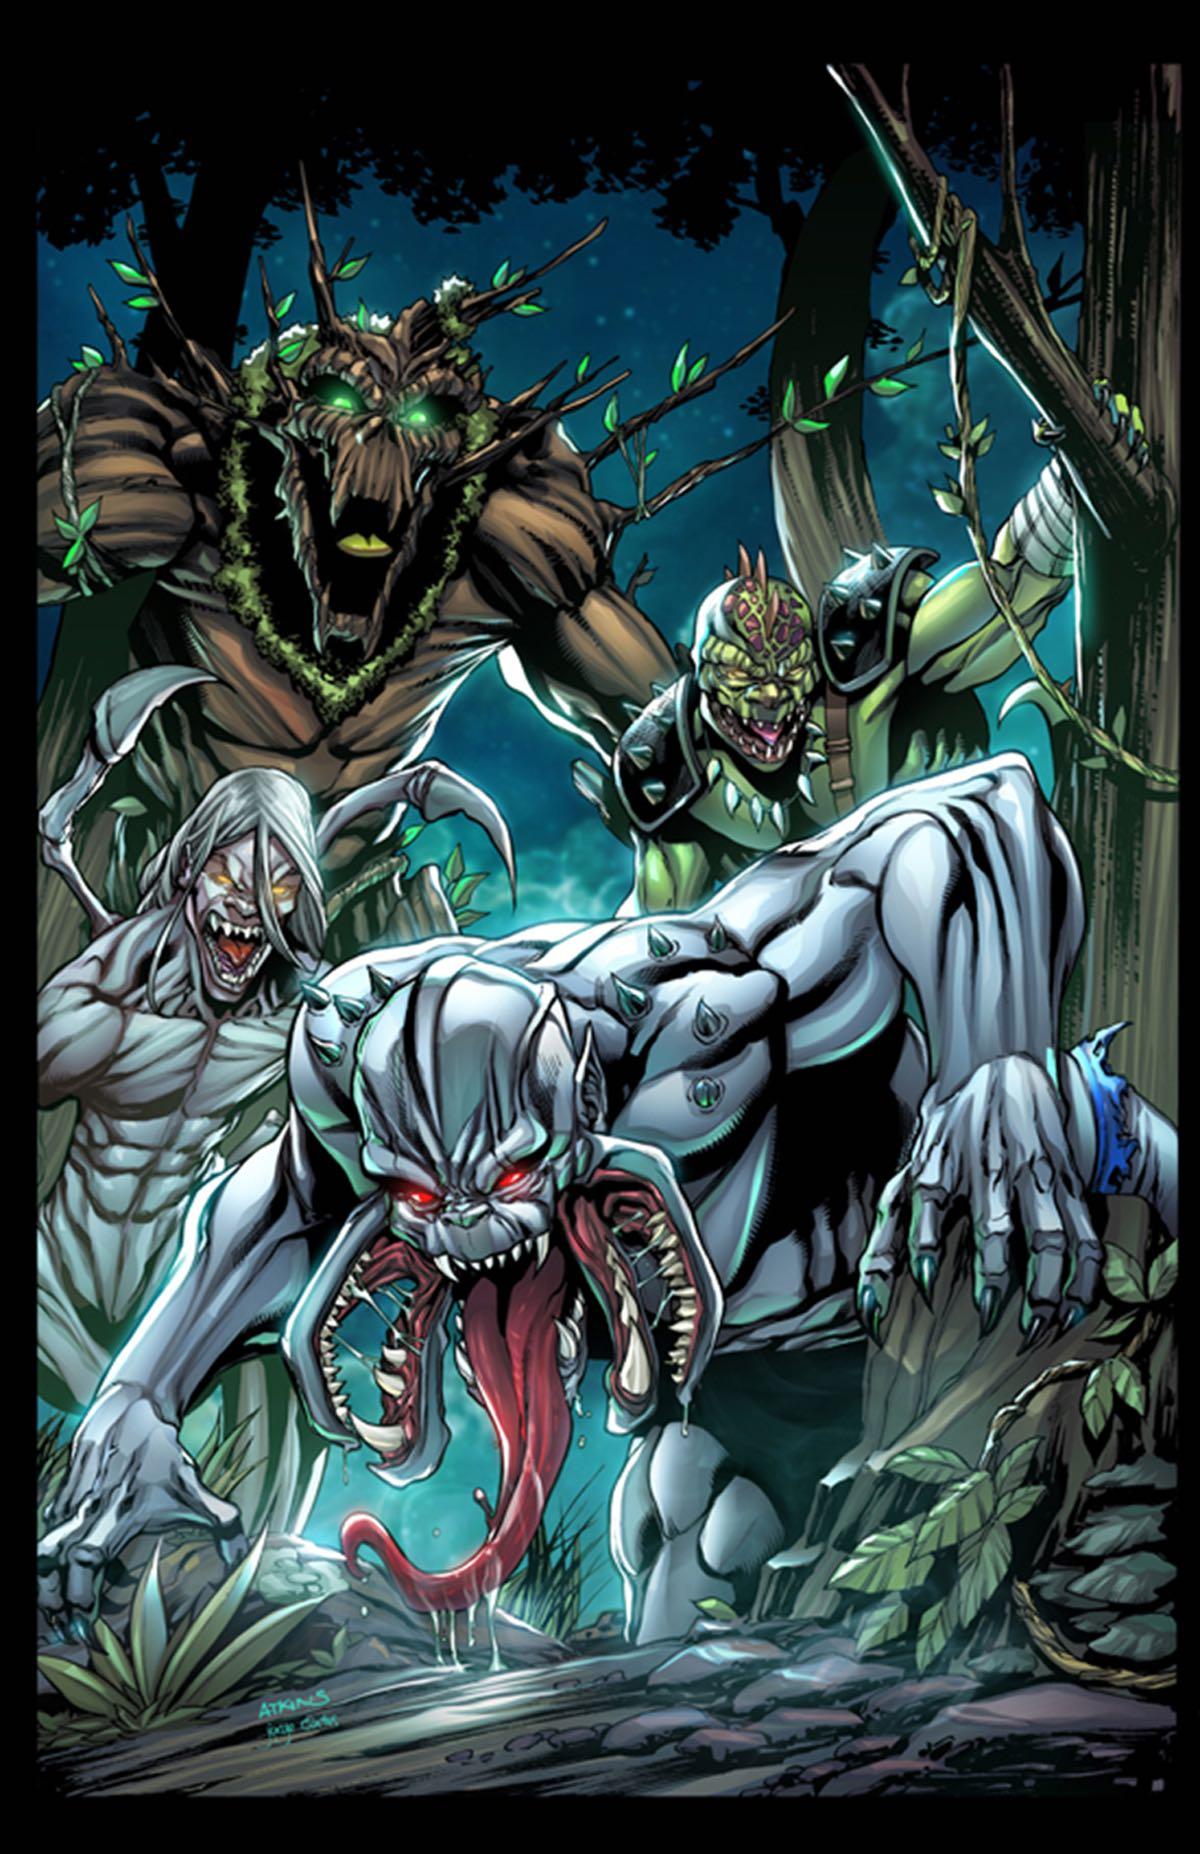 robyn hood the hunt 3 atkins cover fresh comics